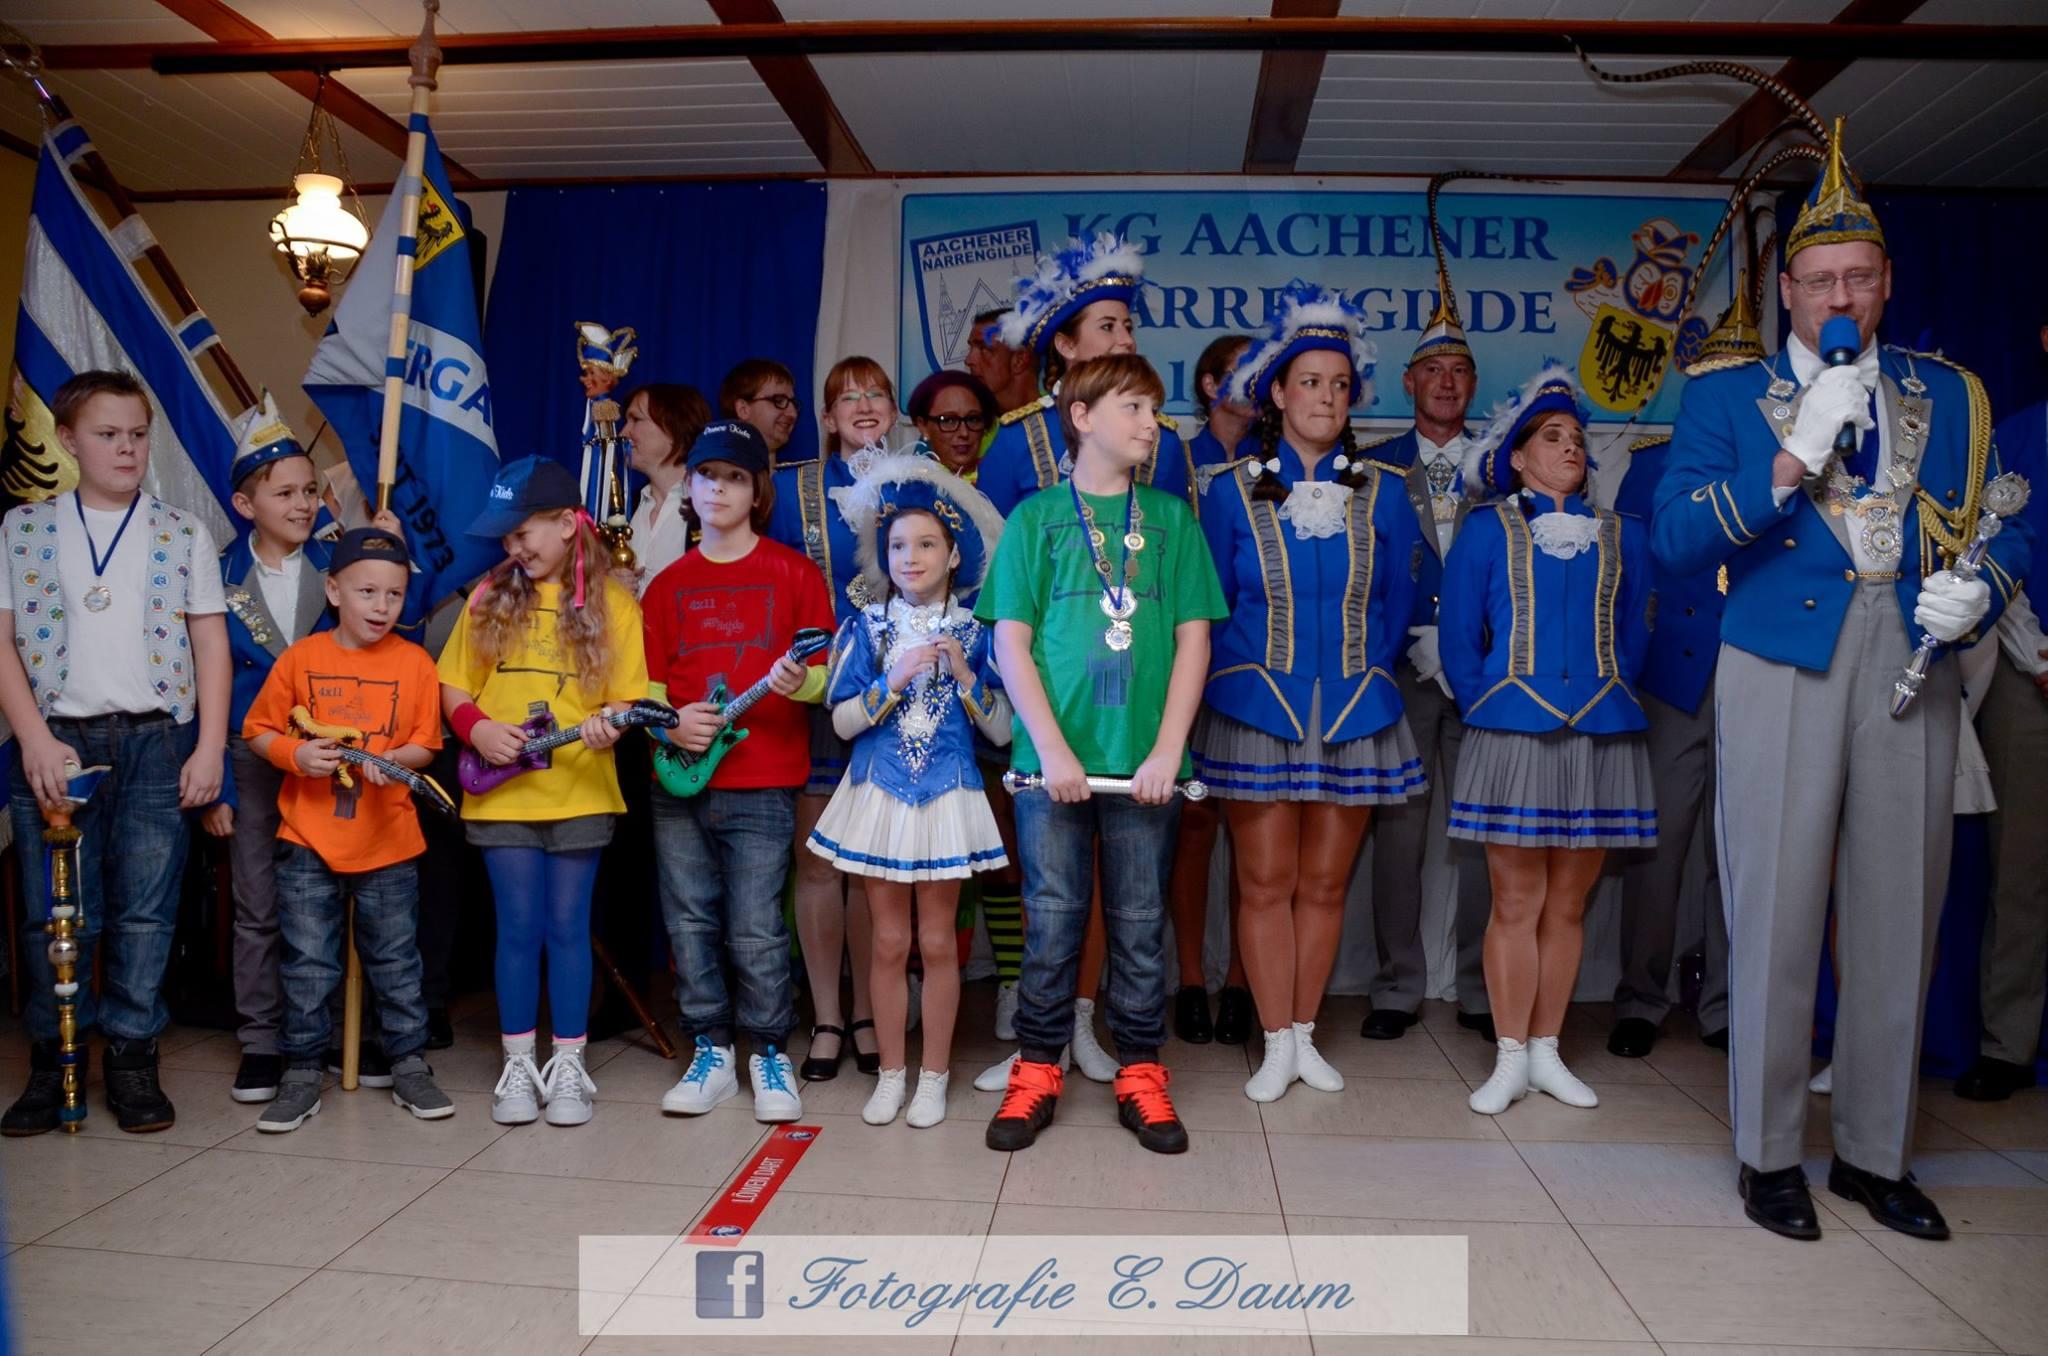 Gruppenbild Kindergarde mit großer Garde